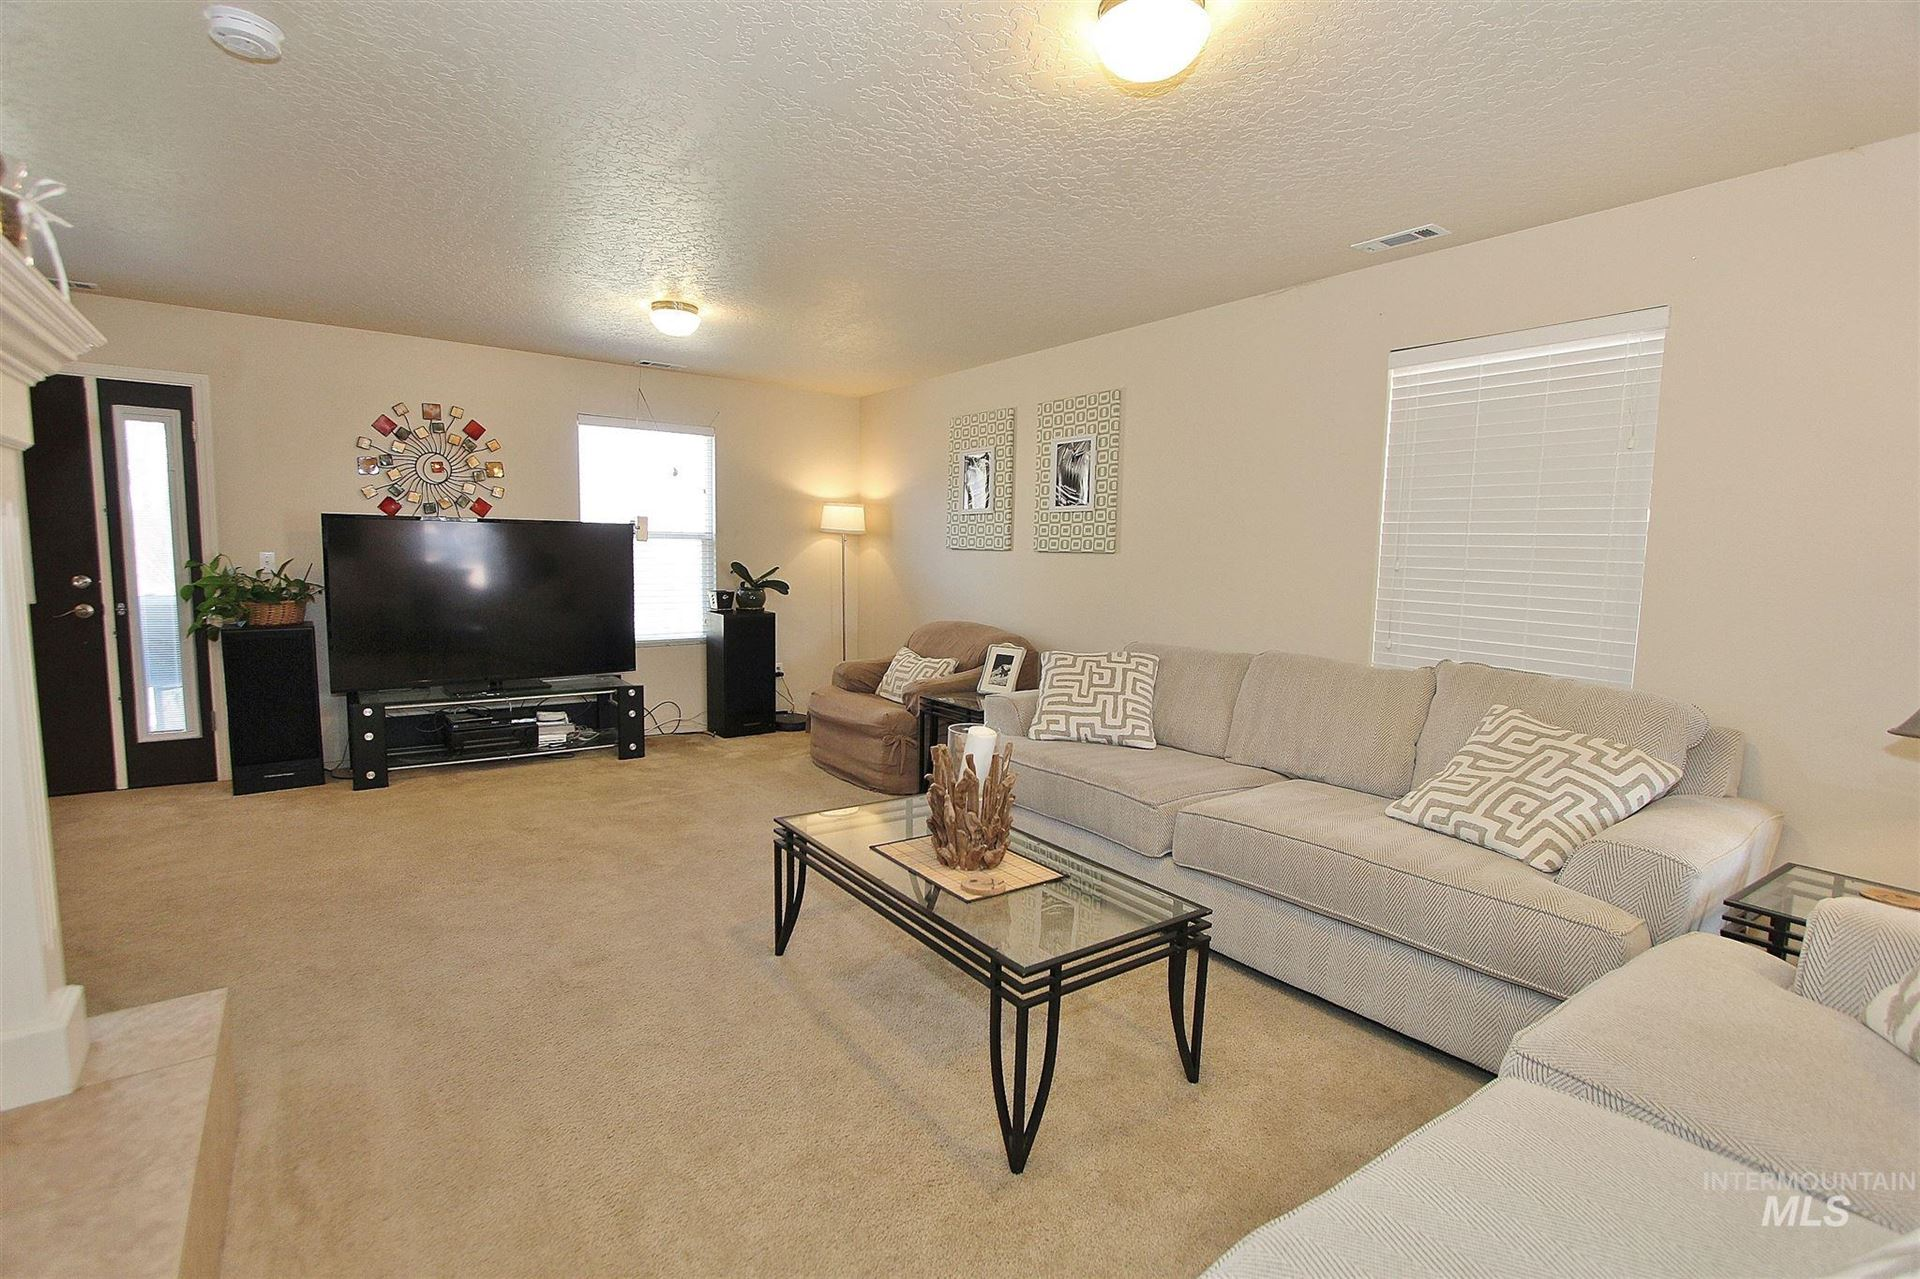 Photo of 6675 S Acacia Ave, Boise, ID 83709 (MLS # 98799060)